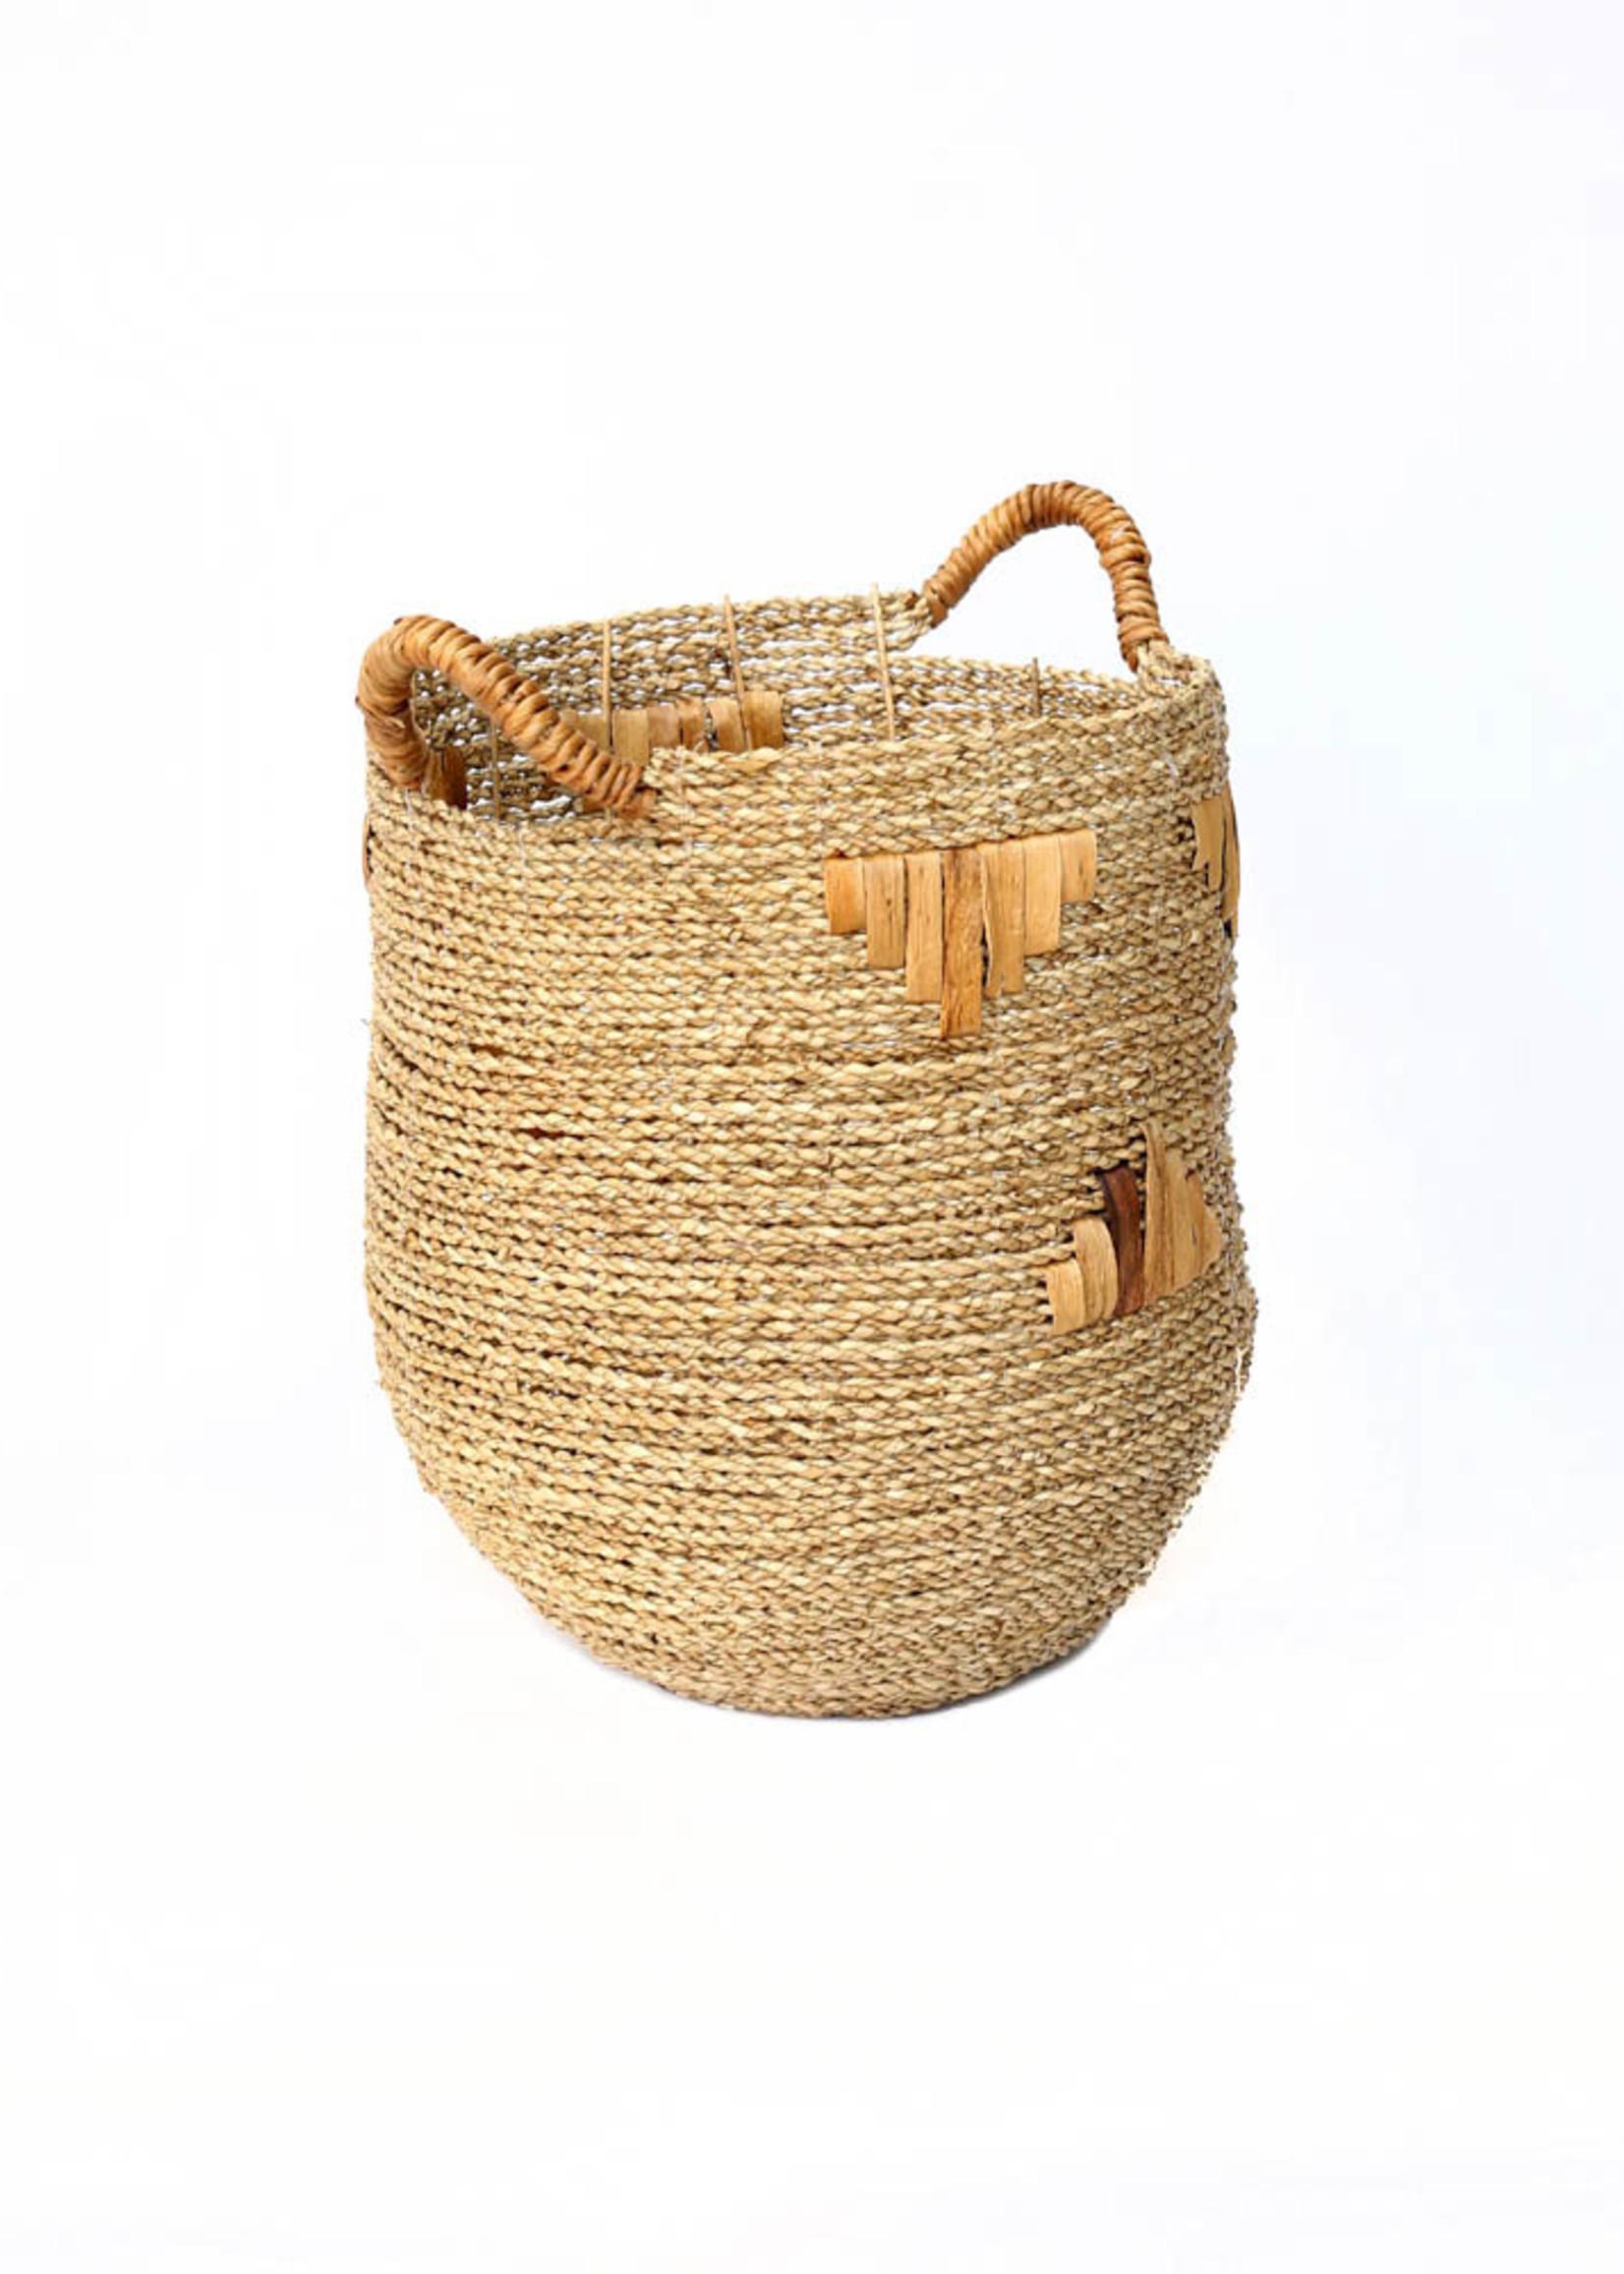 The Chubby Graphic Basket - Medium